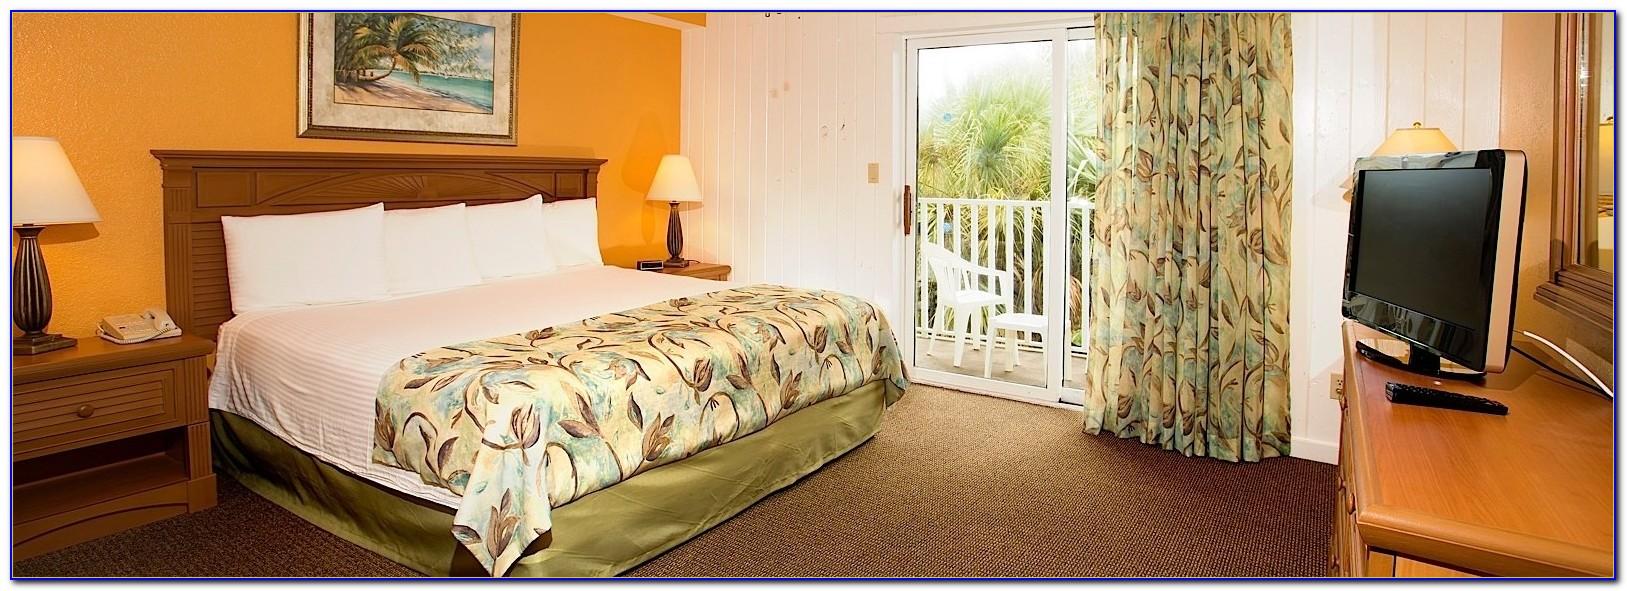 3 Bedroom Suites Near Disney World